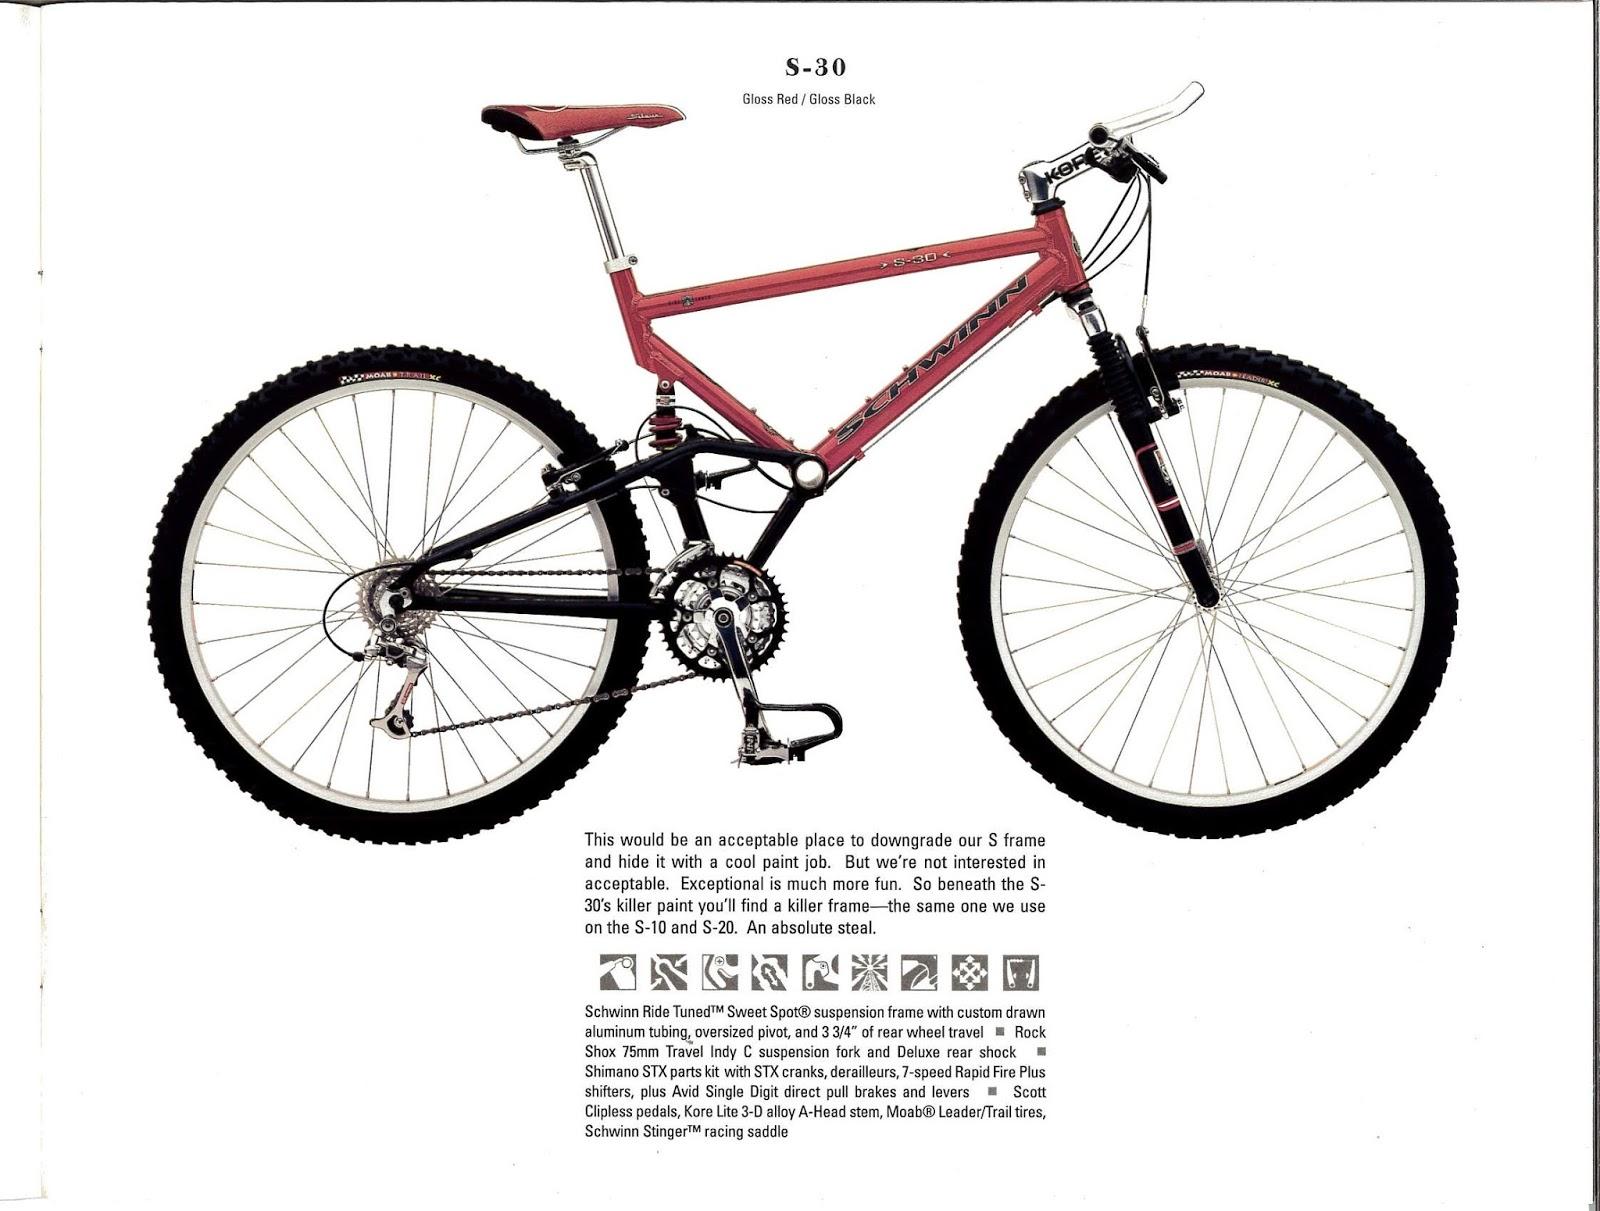 The Old Bike Shop: 1998 Schwinn catalog